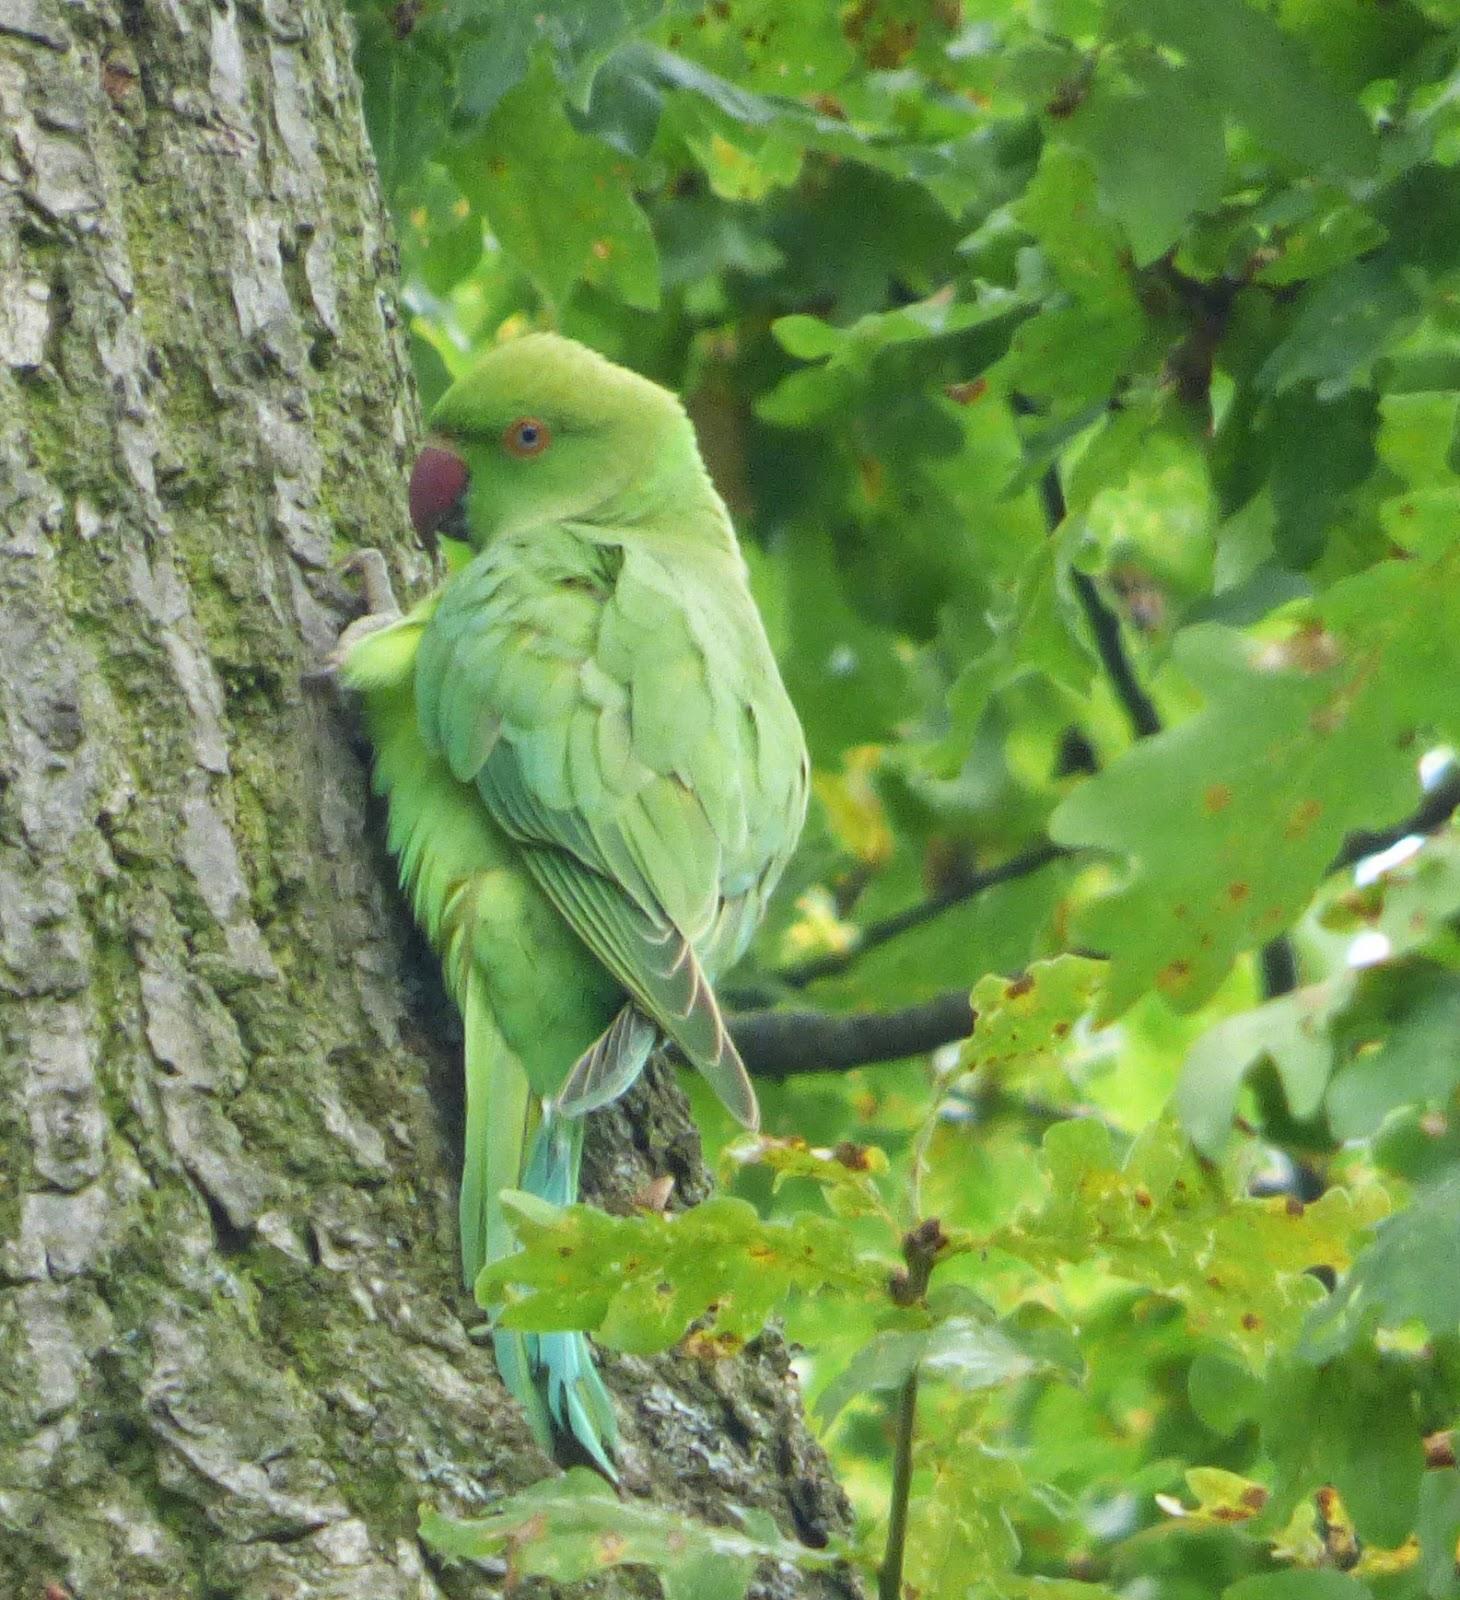 Gregor S Bird And Mammal Blog September